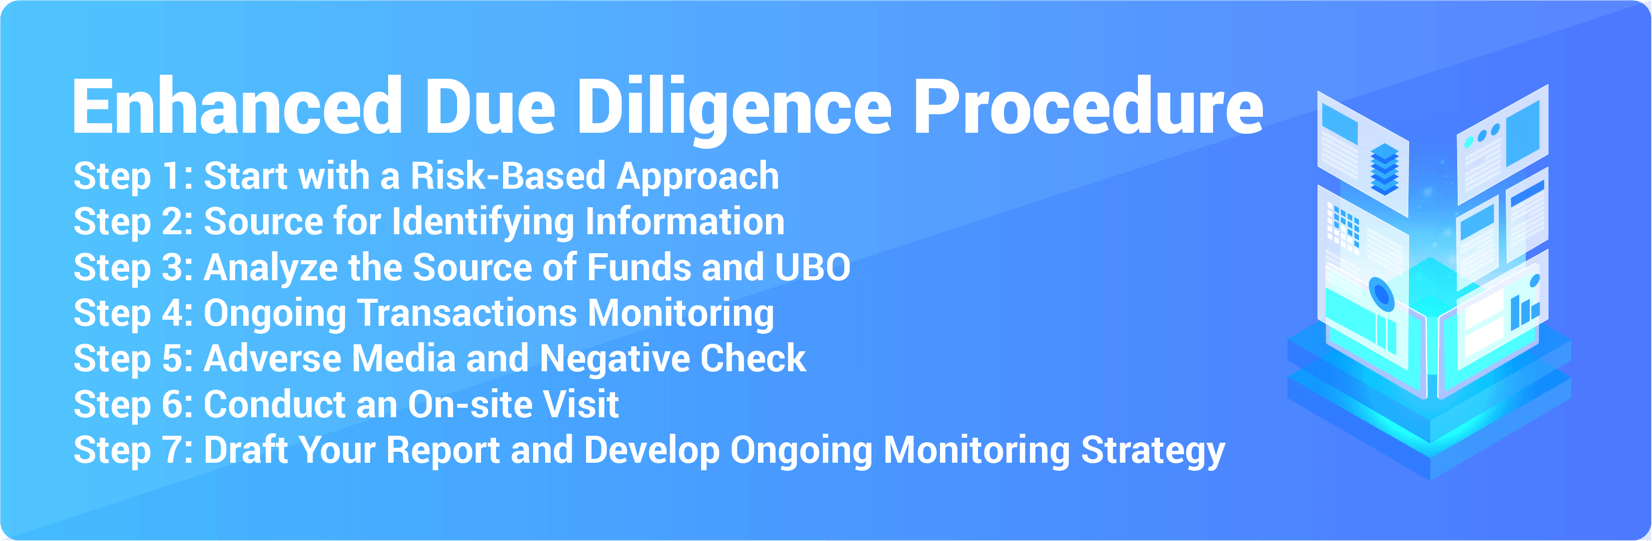 Enhanced Due Diligence Procedures